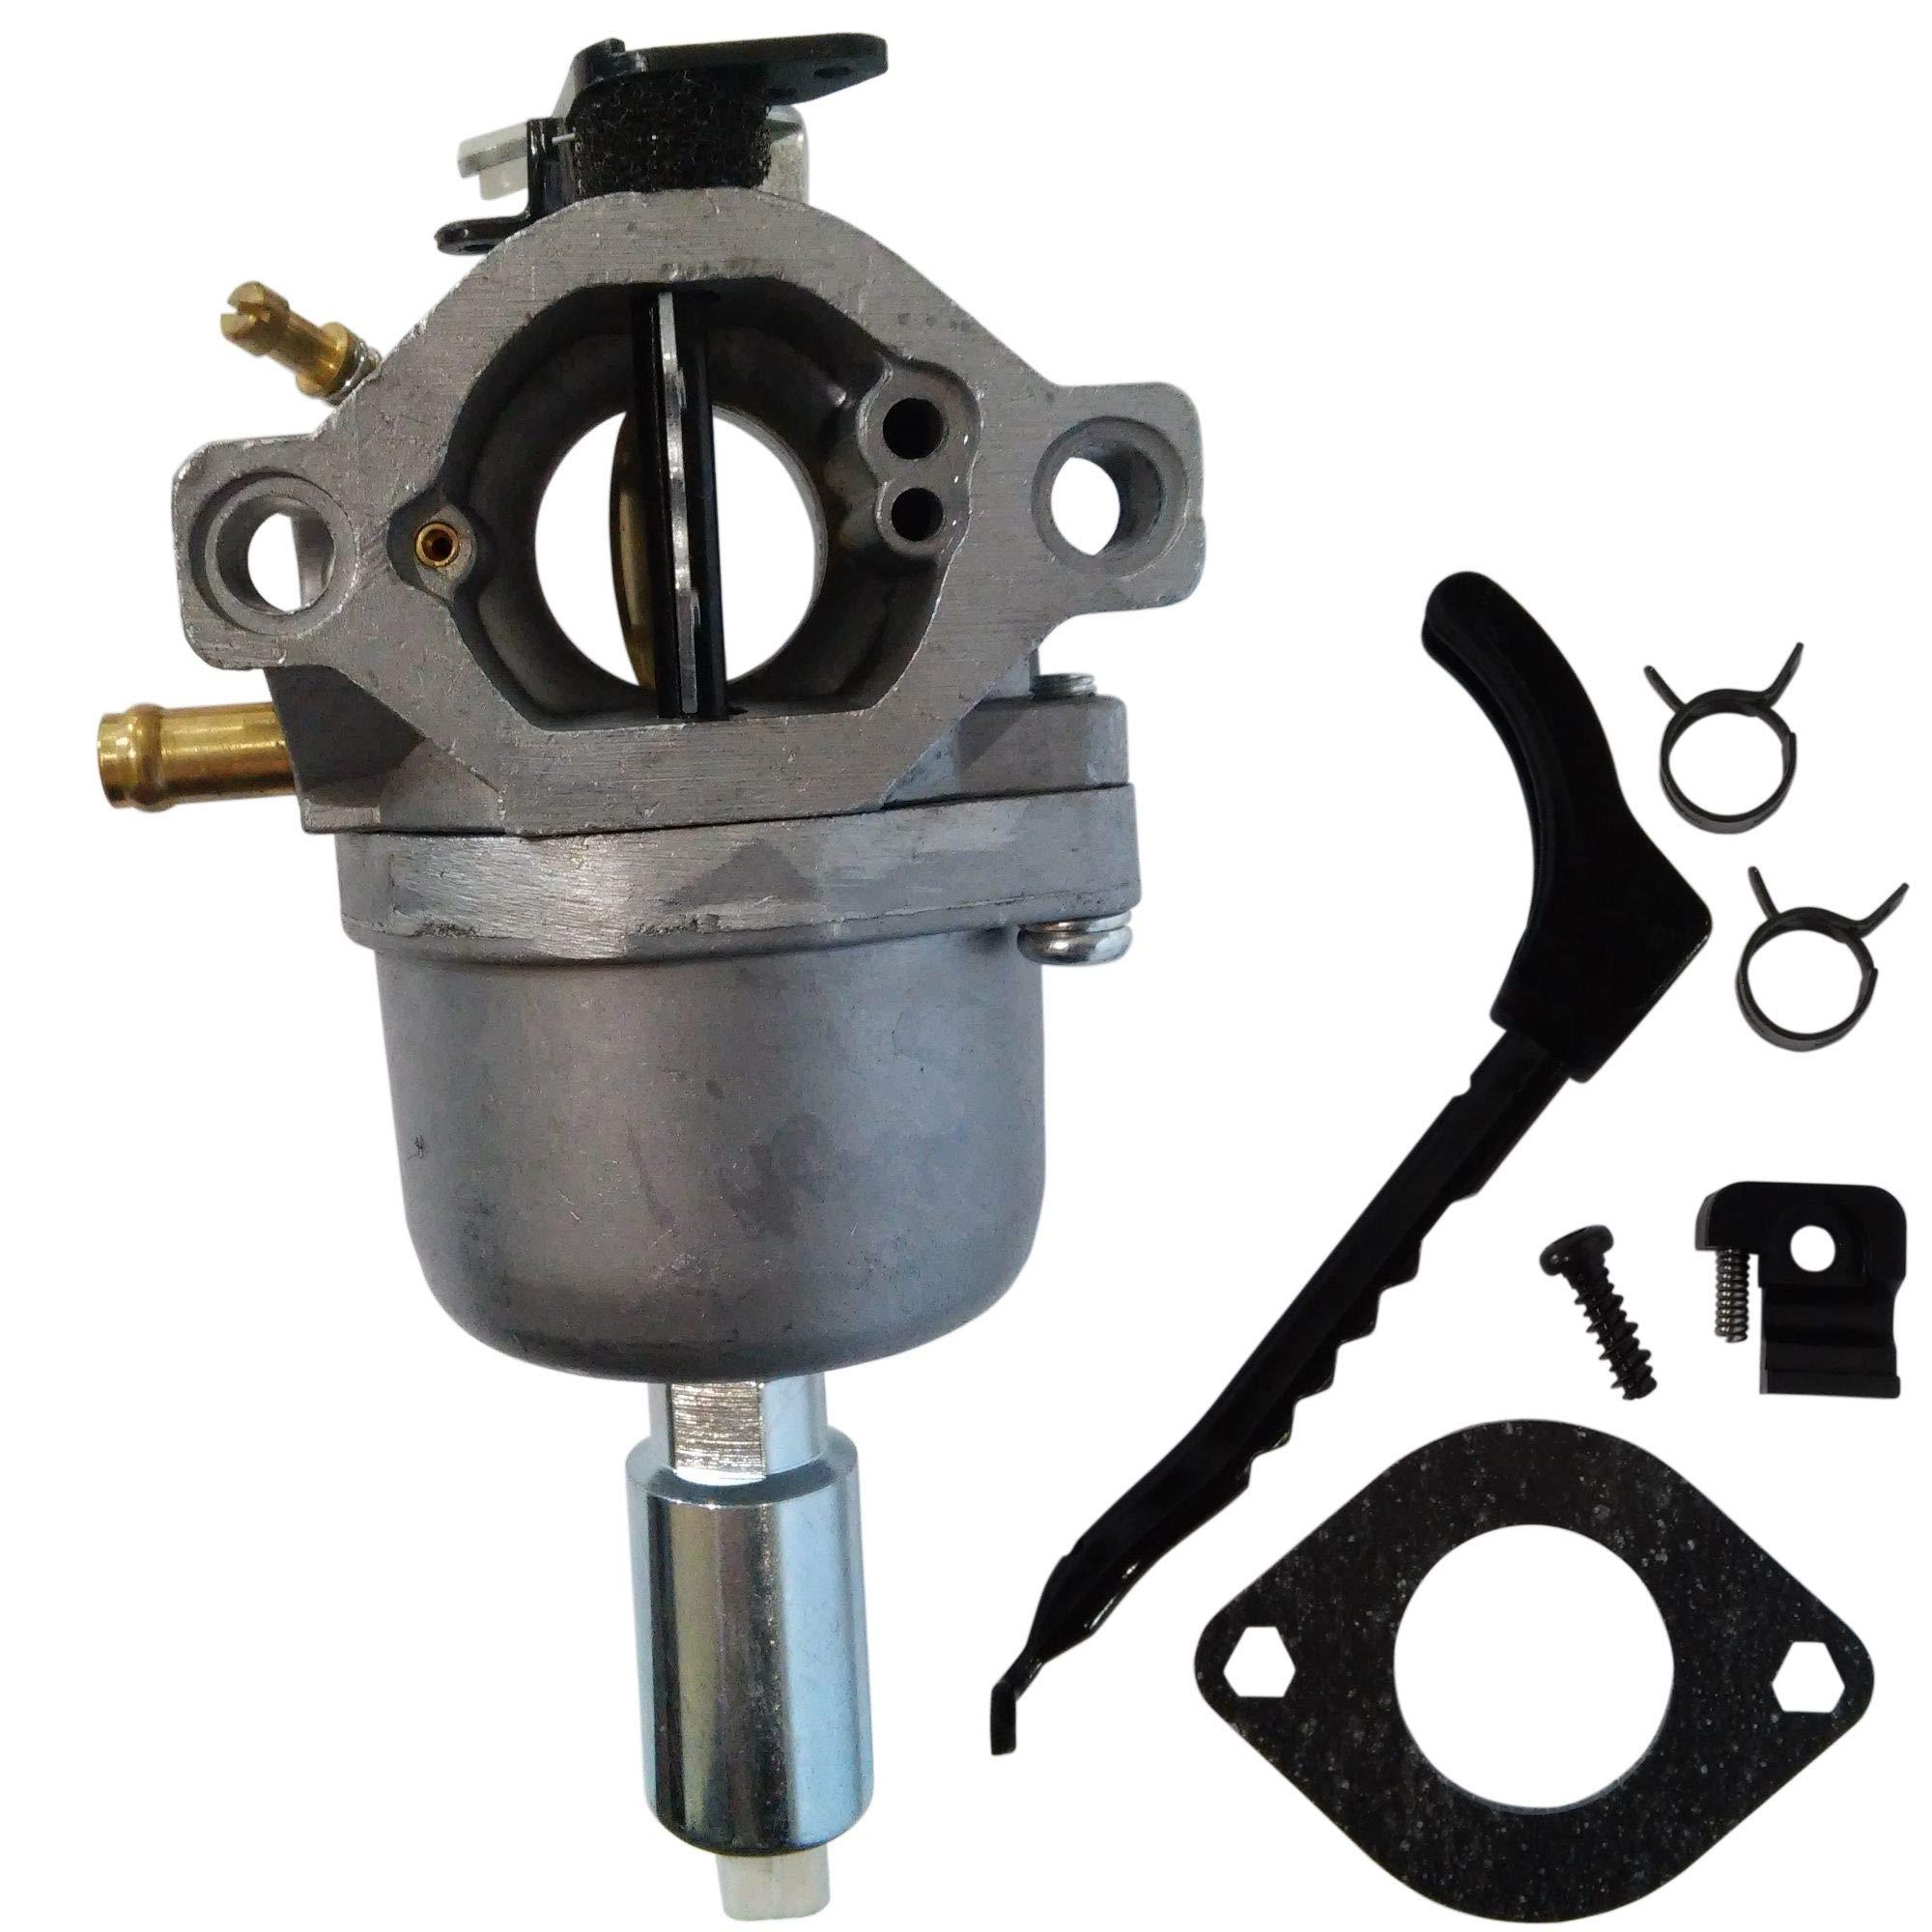 Auto Express Fits Briggs & Stratton 17.5 14 hp 18hp intek Carburetor 794572-793224 Assembly